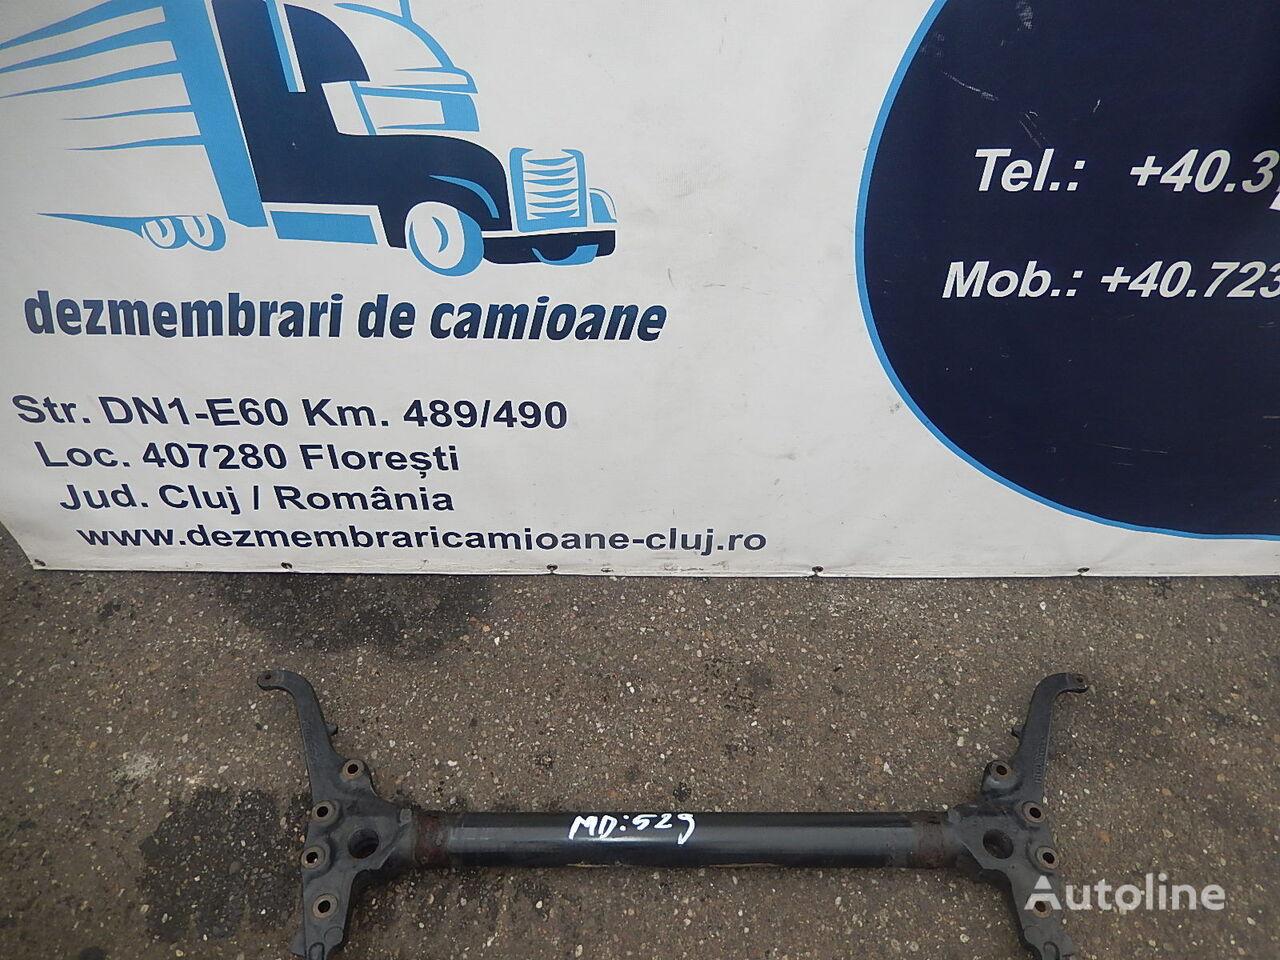 MAN fata cabina Tgx 2008 / M112/529 / 81412803699 holder for MAN TGX tractor unit